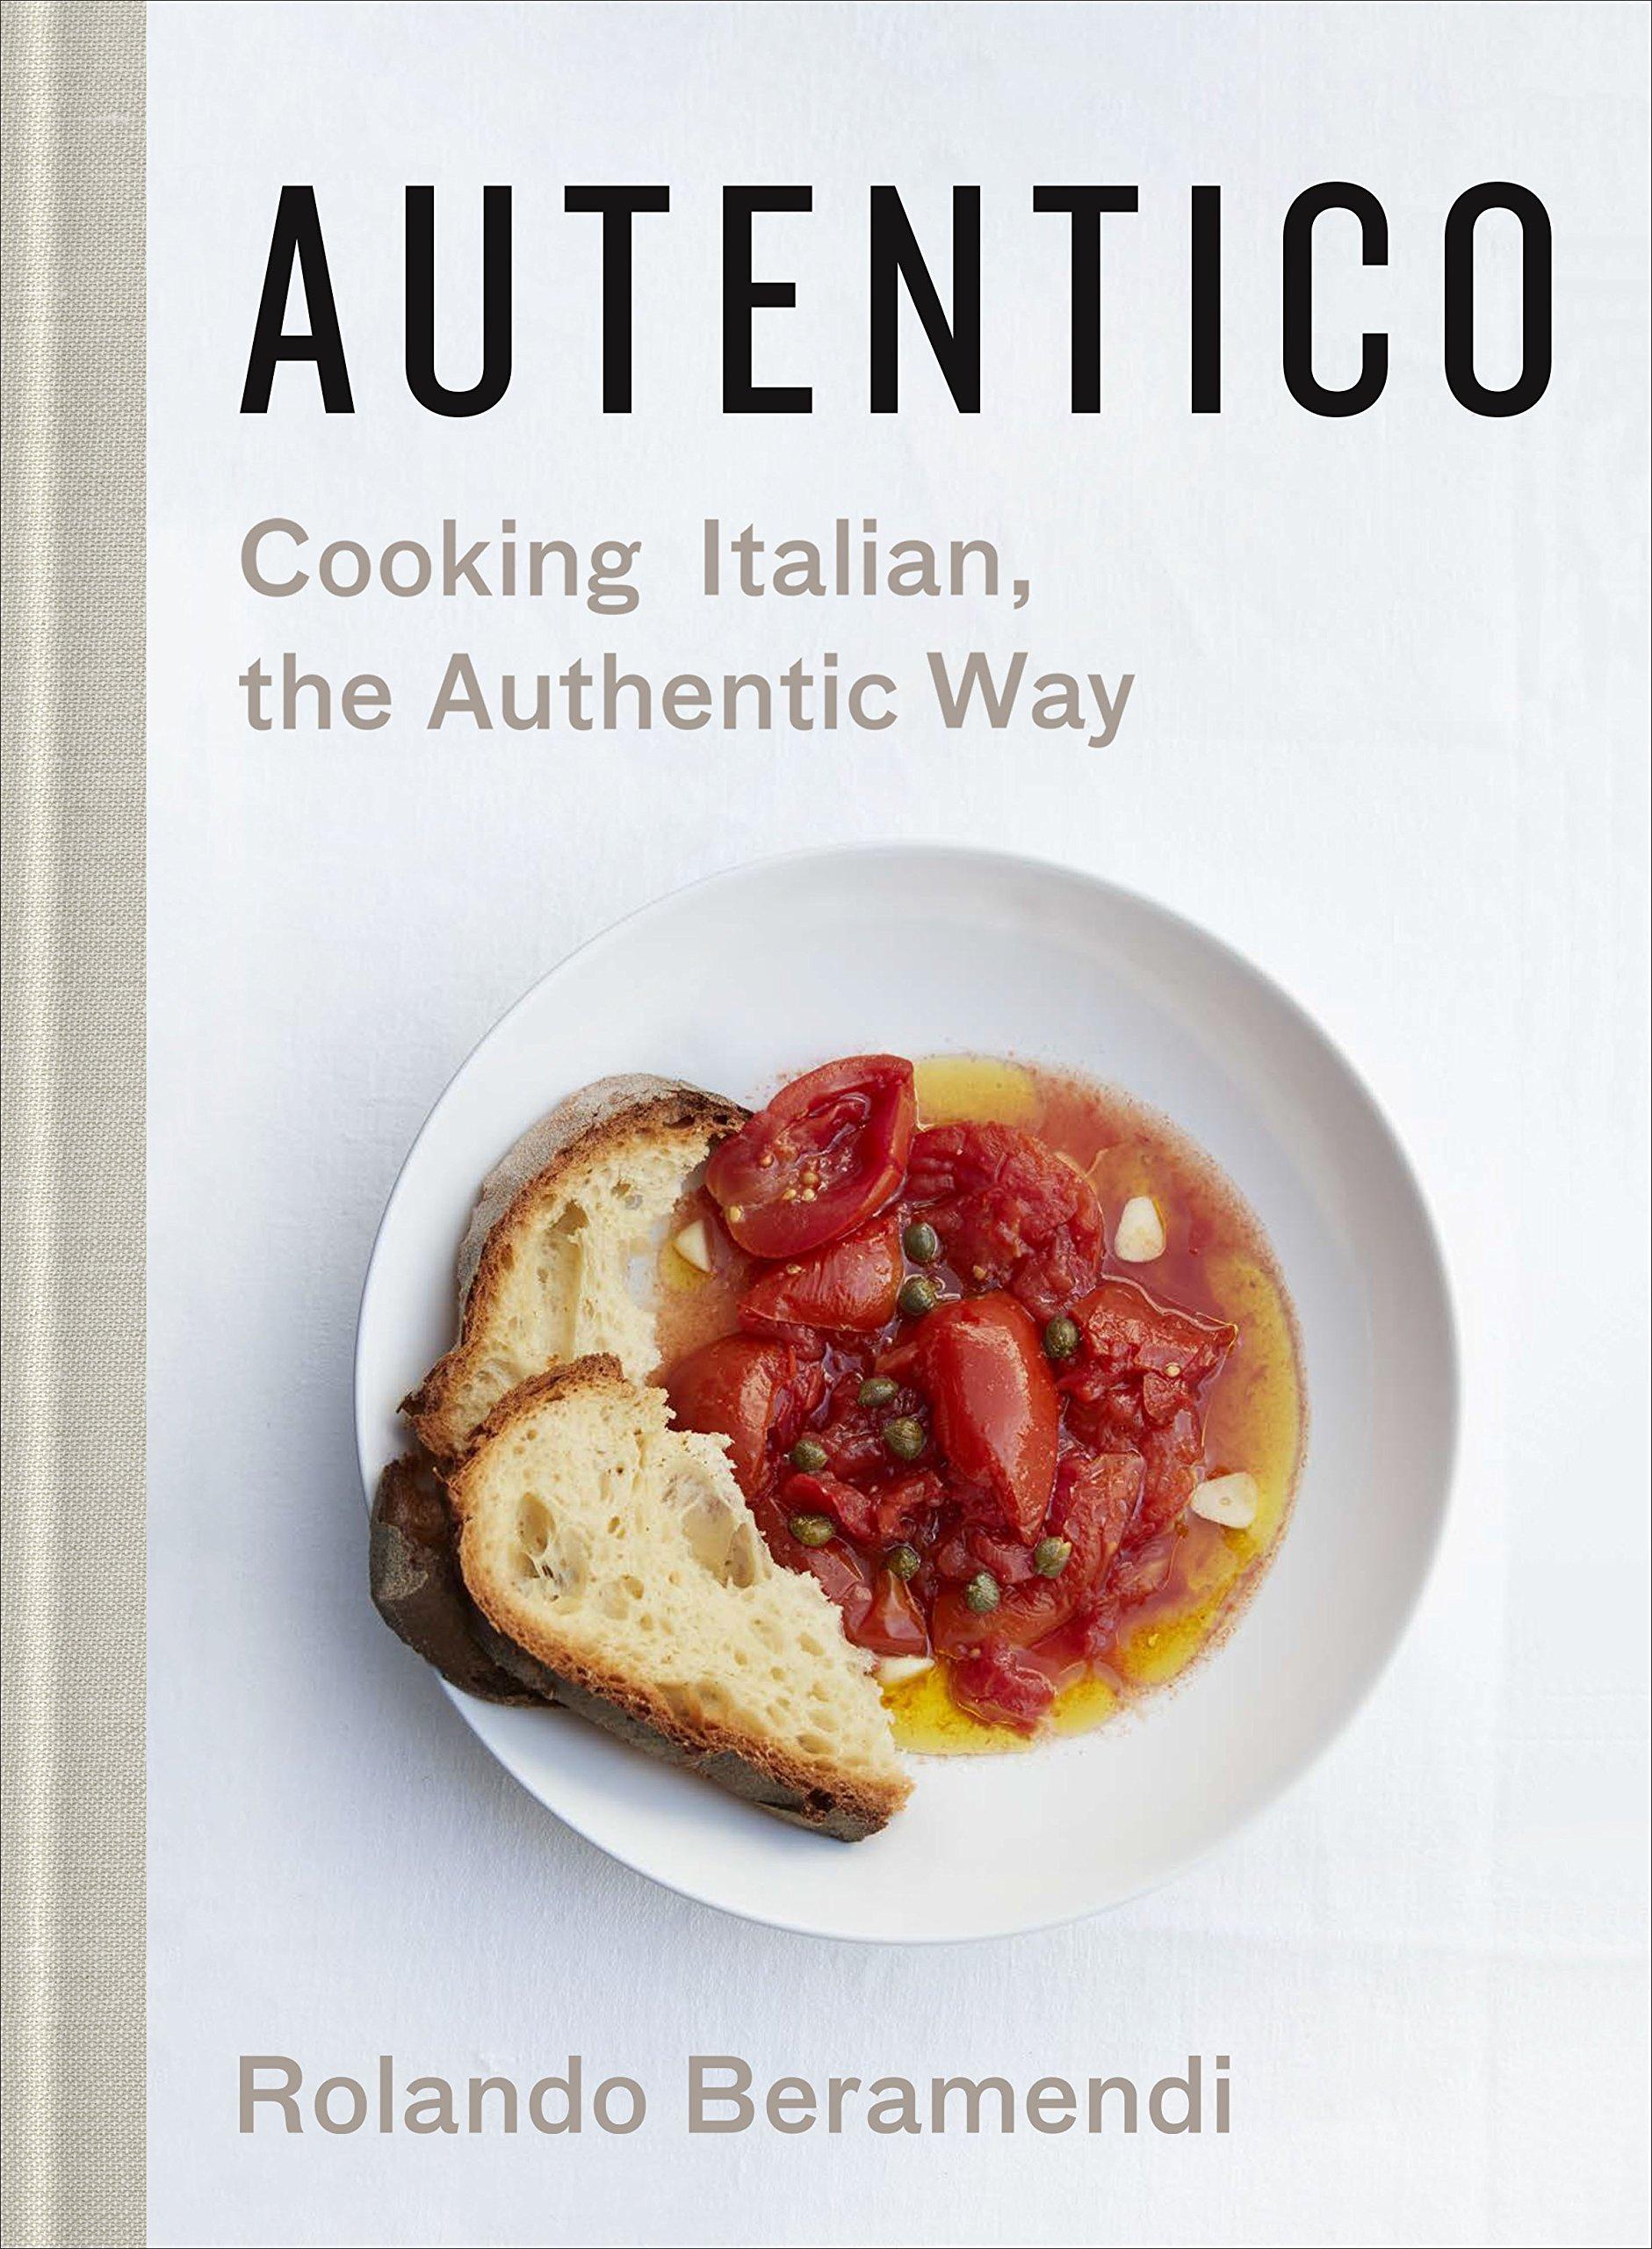 Autentico: Cooking Italian, The Authentic Way: Rolando Beramendi, Laurie  Frankel, Rebekah Peppler: 9781250124975: Amazon: Books